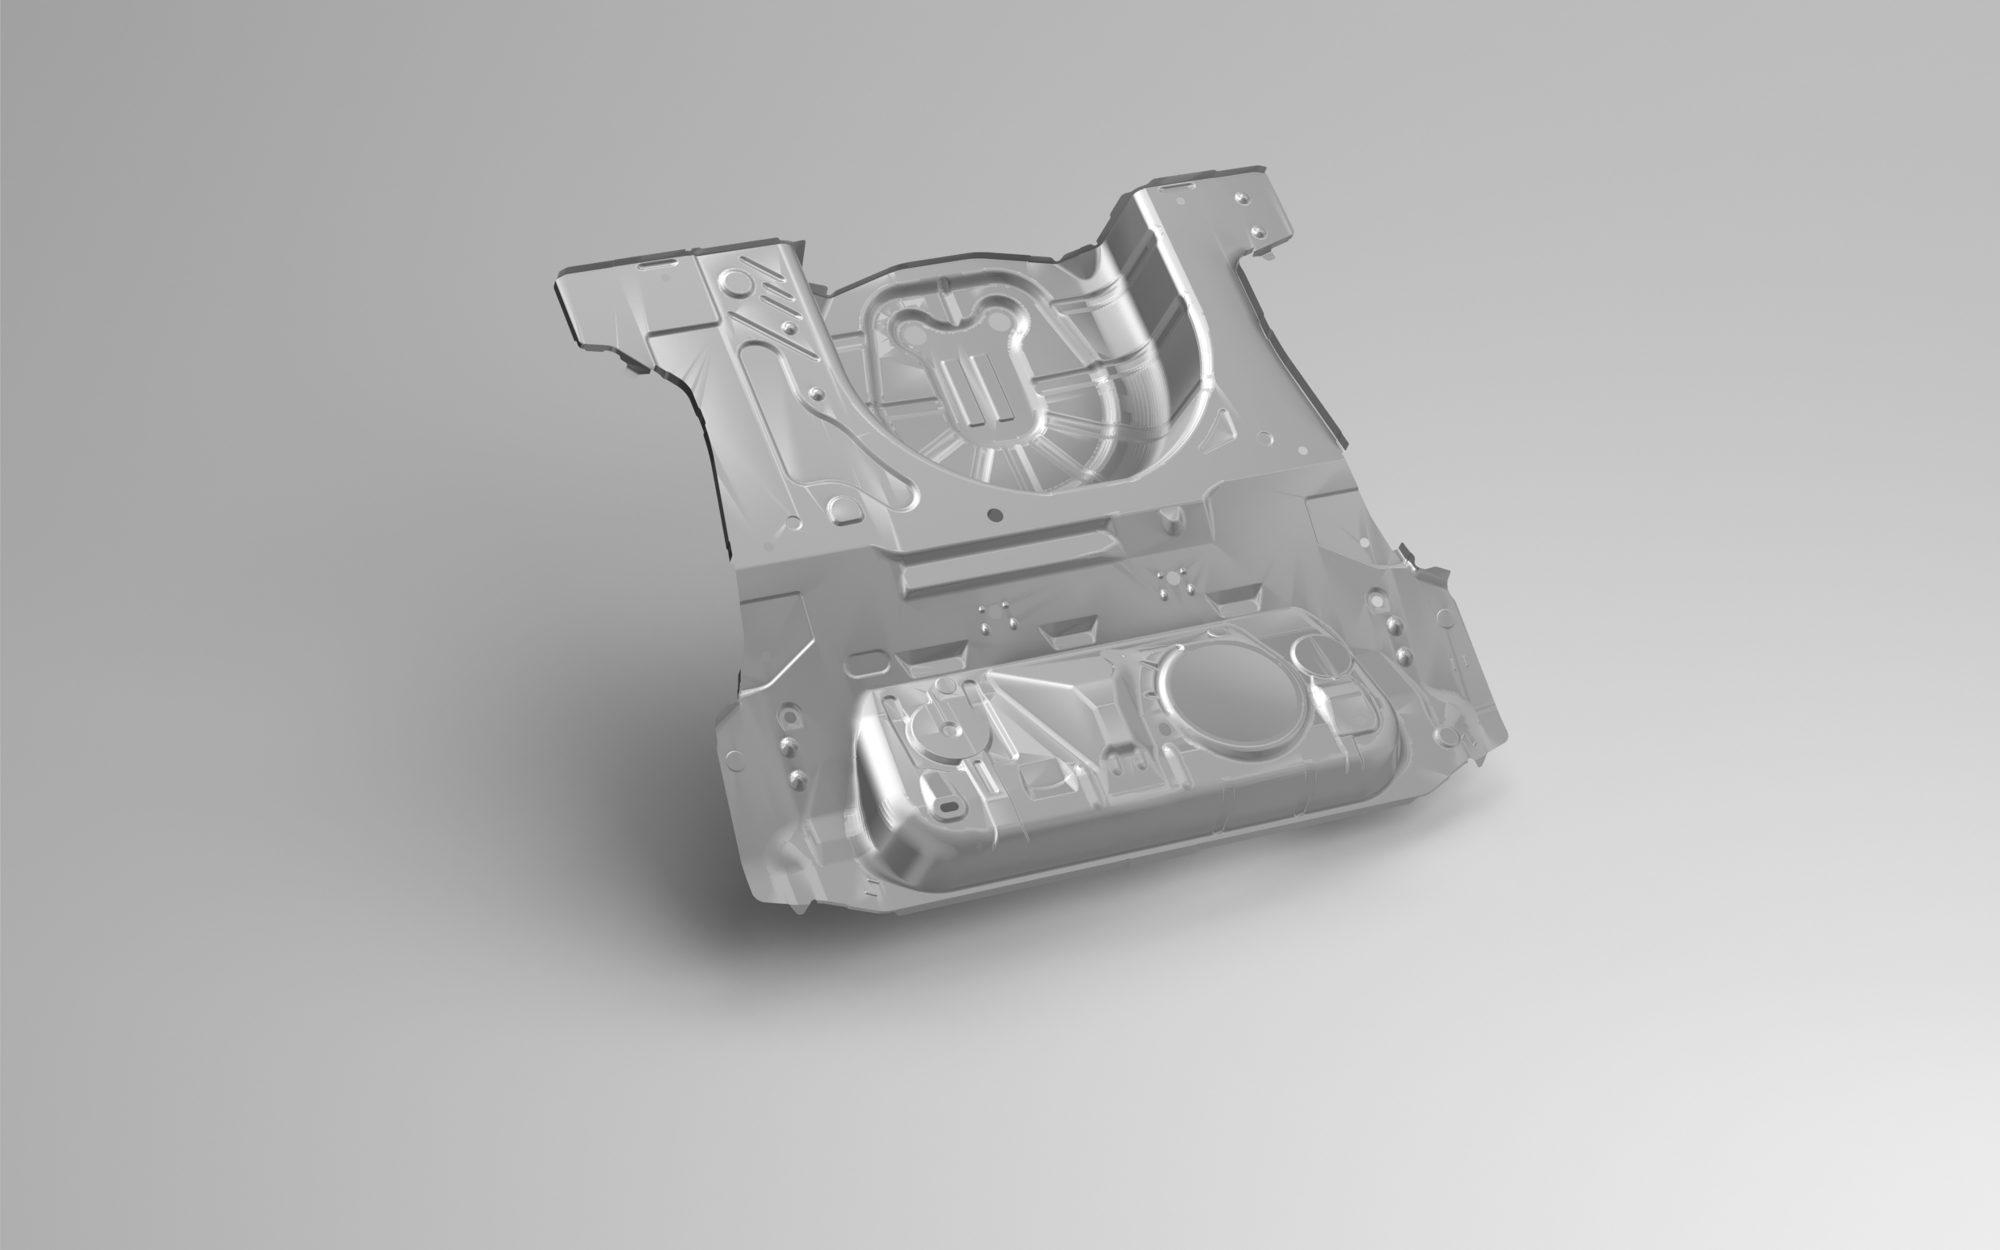 GRACO-PhotonAG-Rendering-3D-Illustration